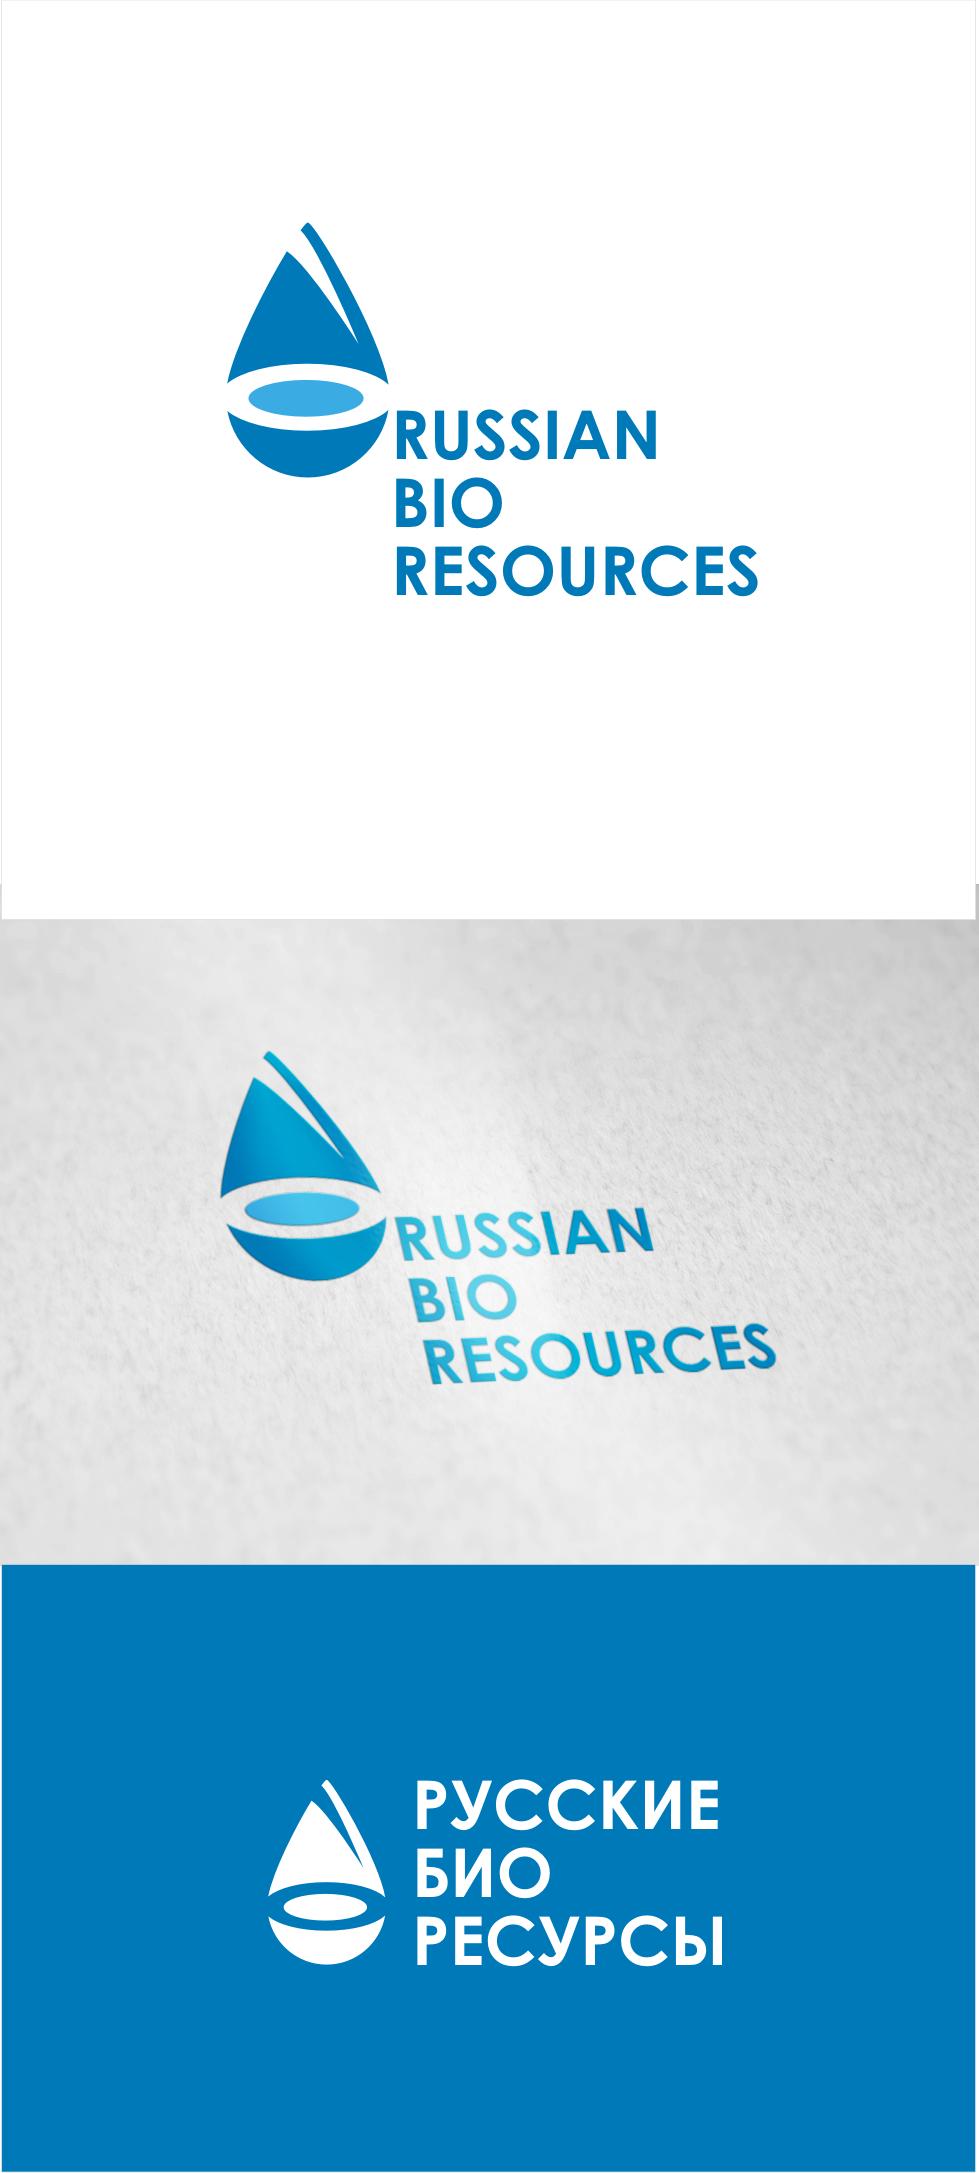 Разработка логотипа для компании «Русские Био Ресурсы» фото f_38058f9c661233ae.png